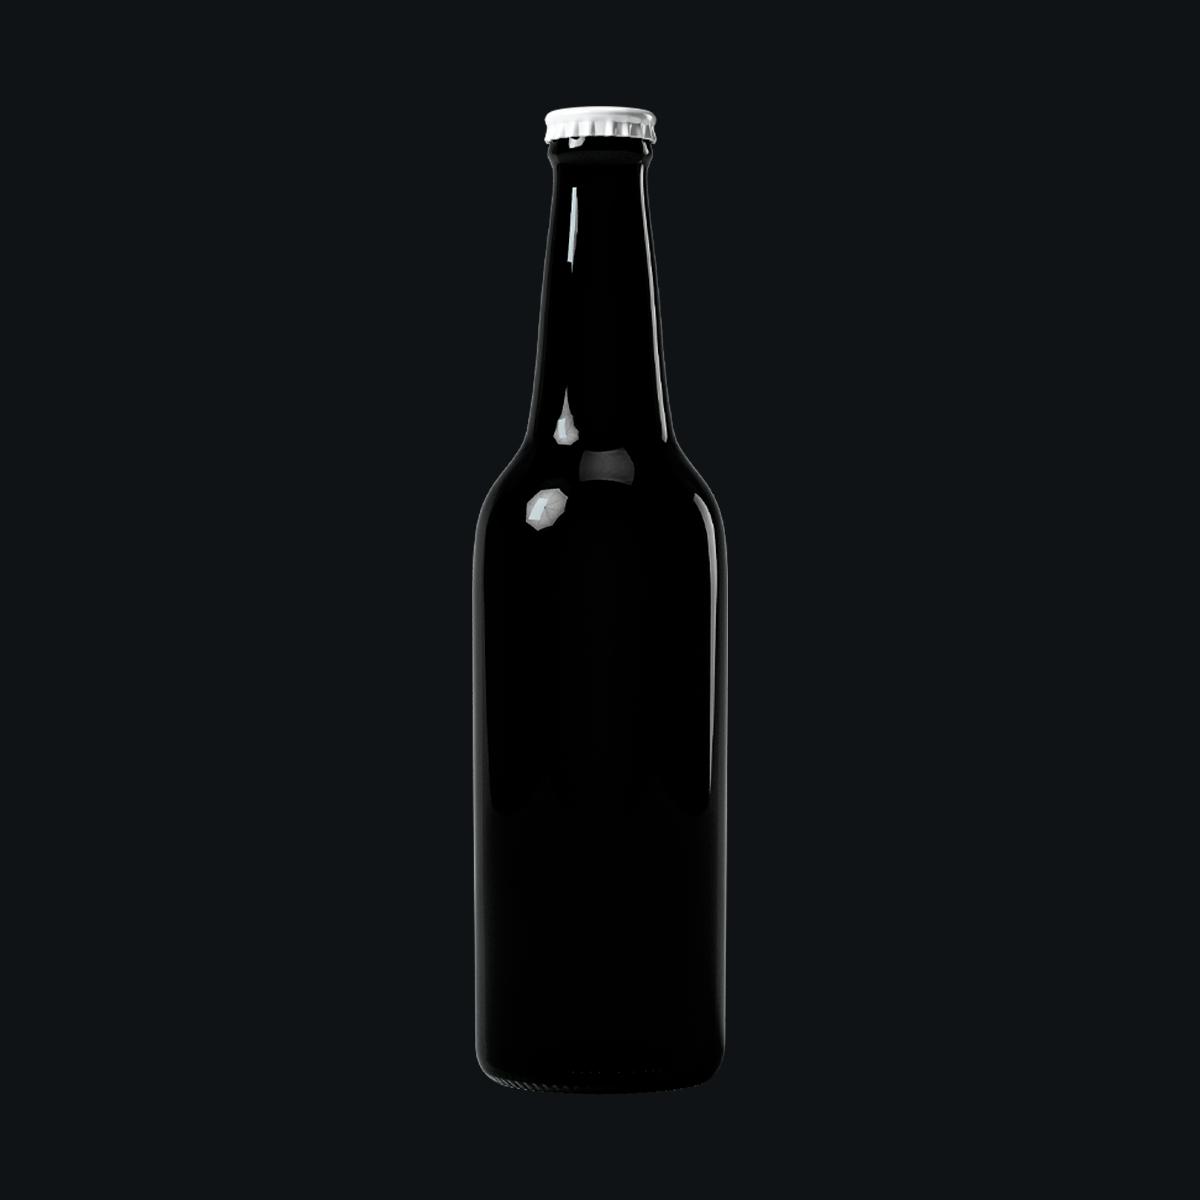 Marsala barrel-aged wild ale